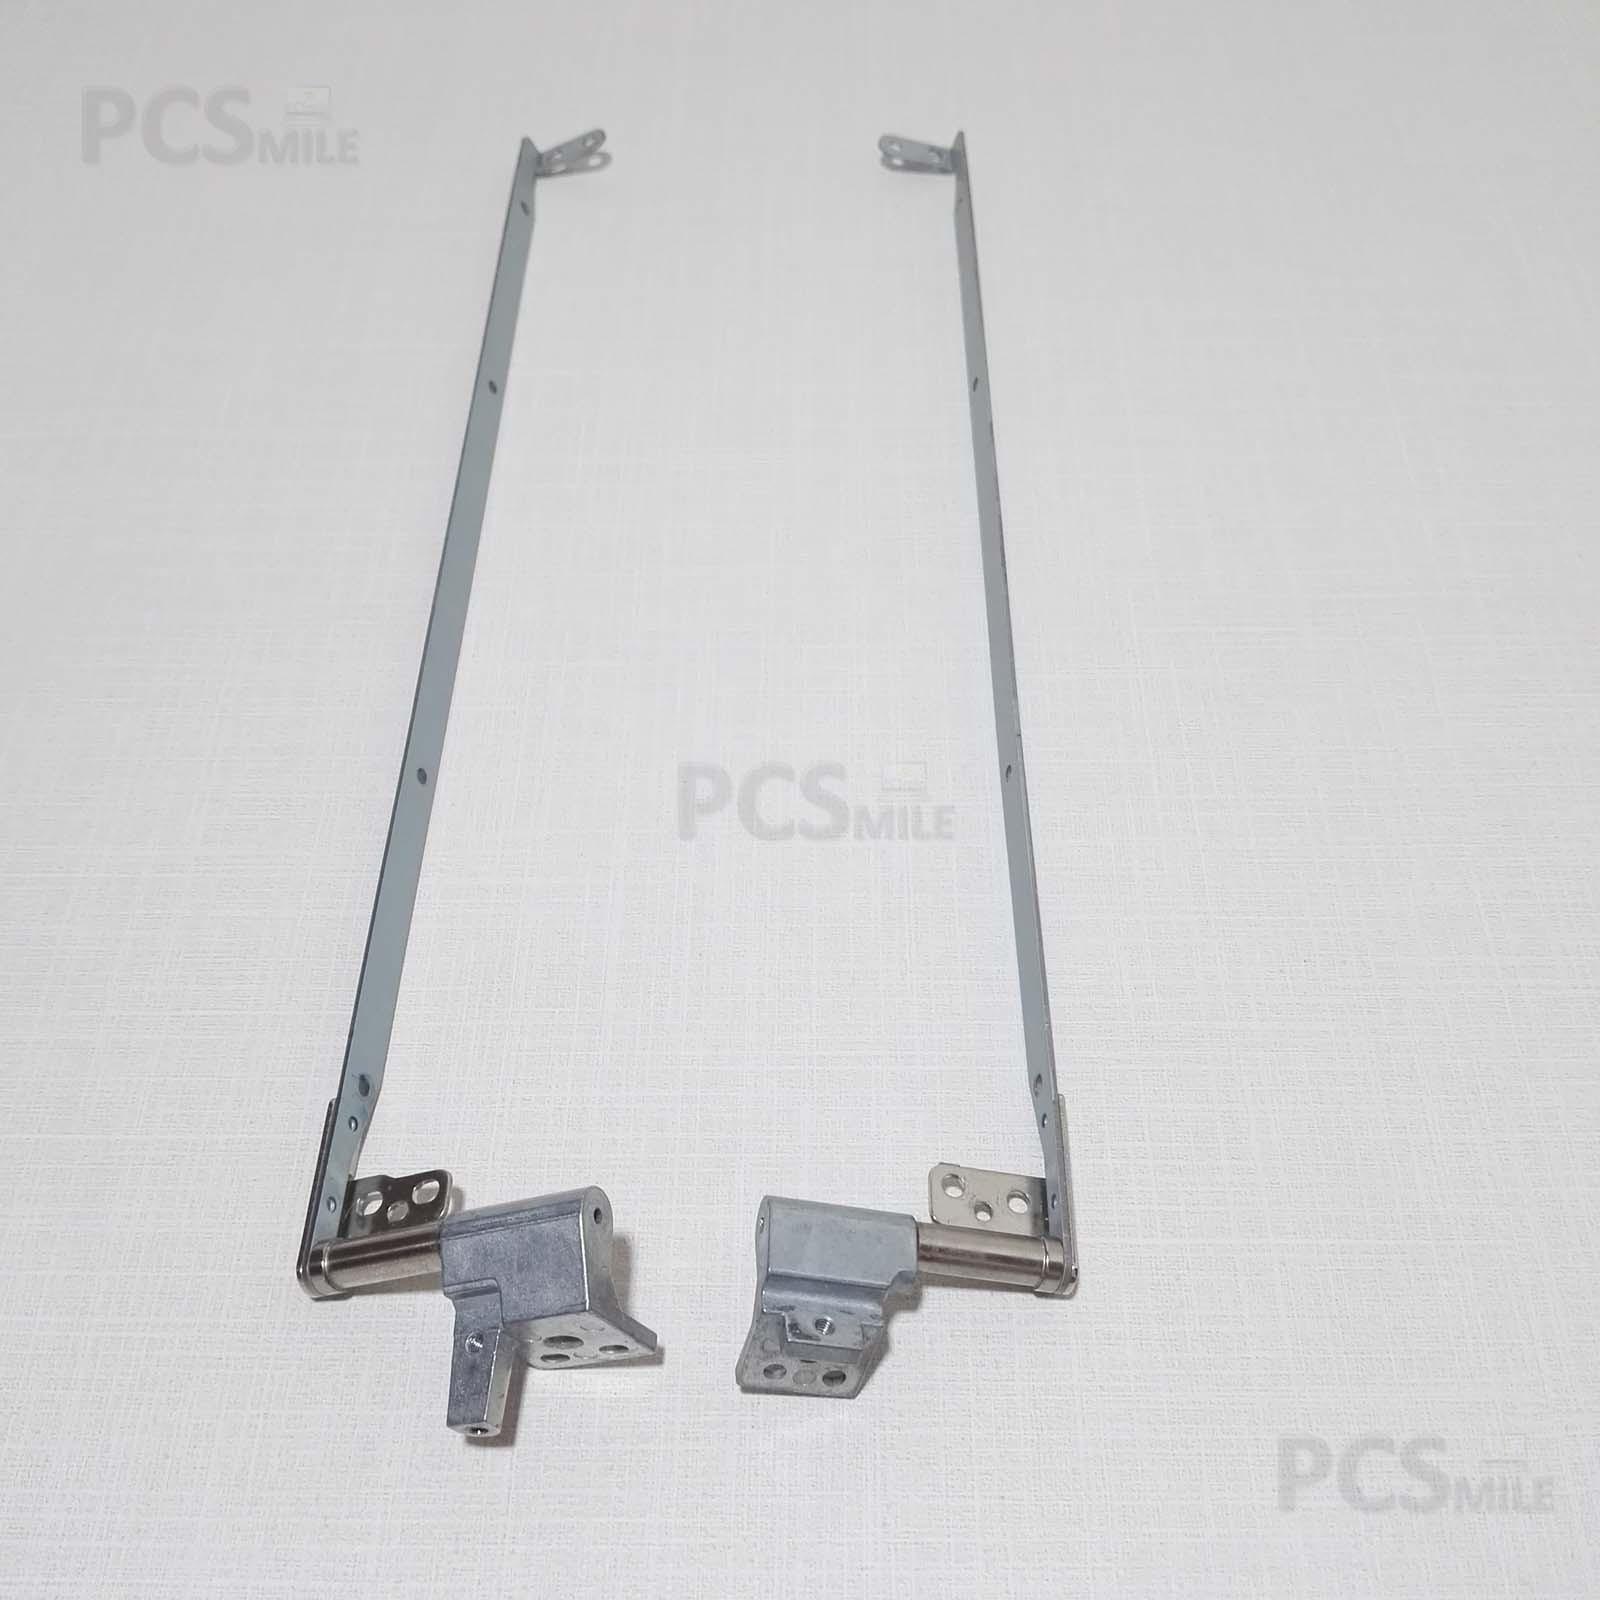 Bracket cerniere Olidata tehom CW4800 AMZHM000100 AMZHM000200 supporti LCD